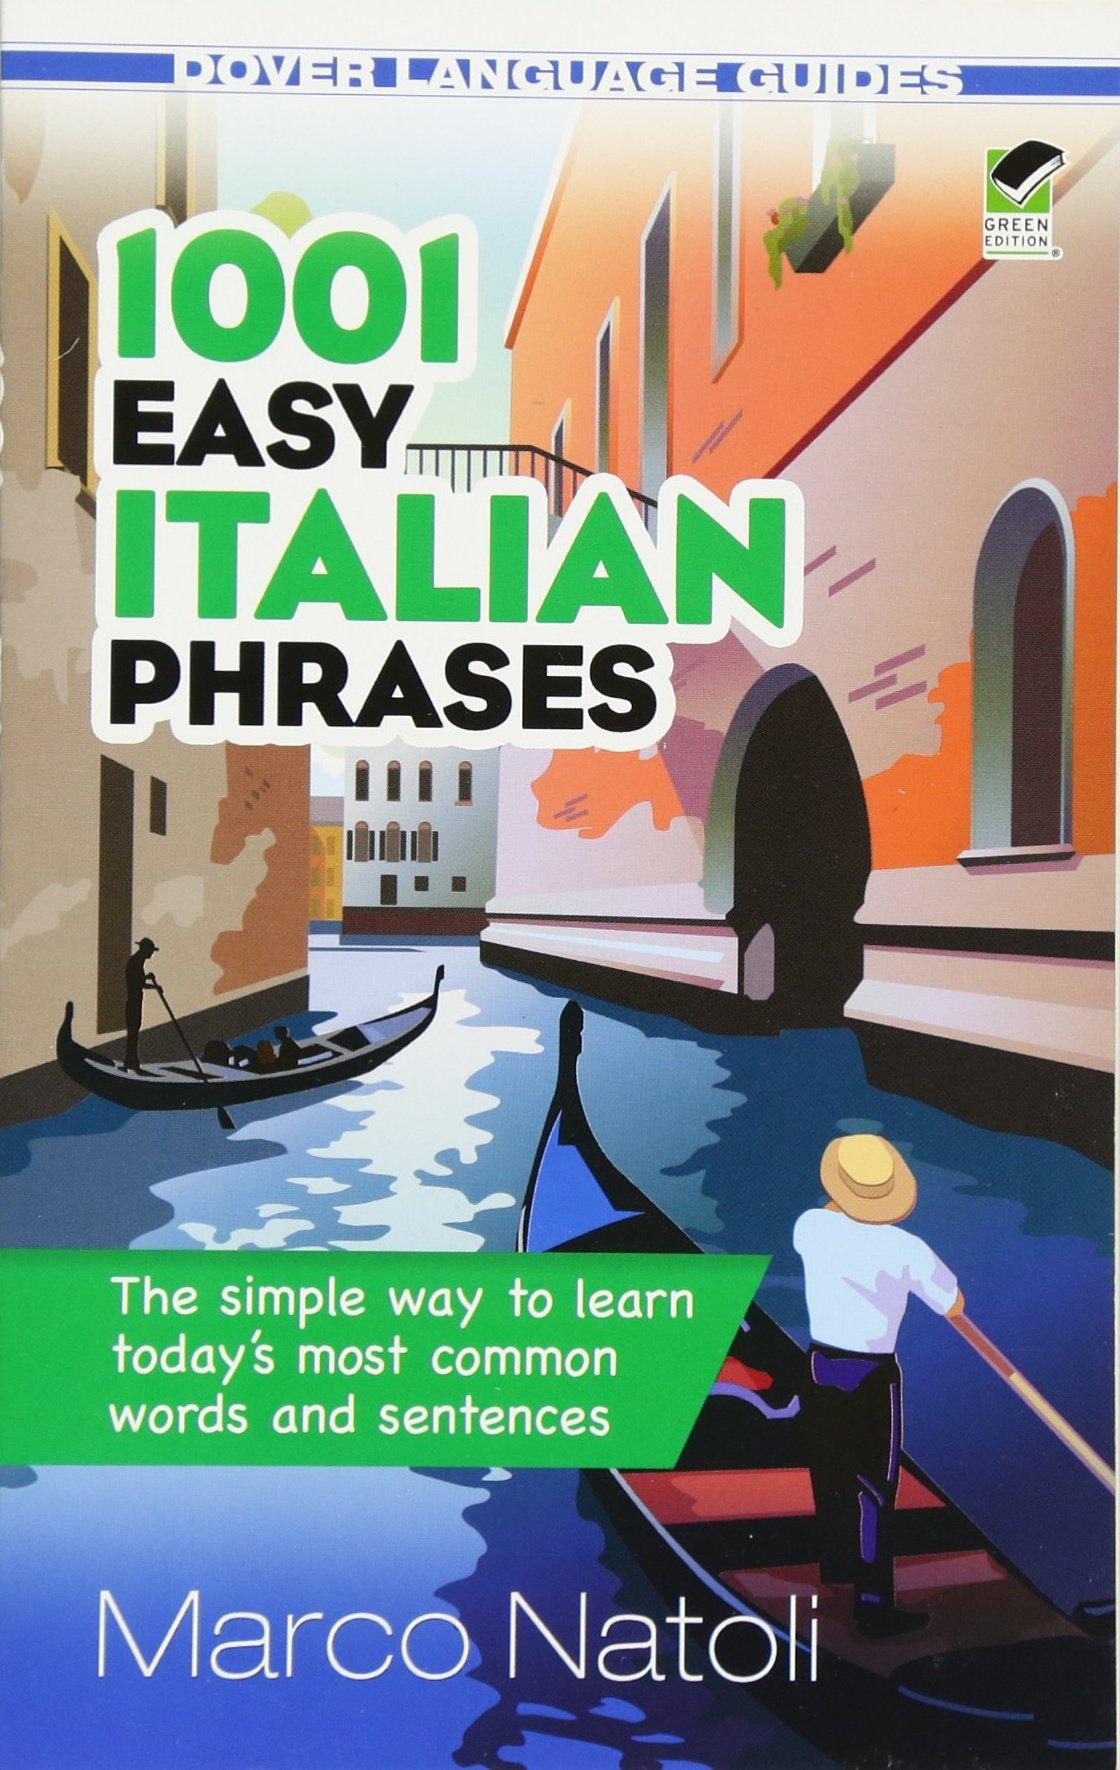 1001 Easy Italian Phrases (Dover Language Guides Italian): Marco Natoli:  9780486476292: Amazon.com: Books